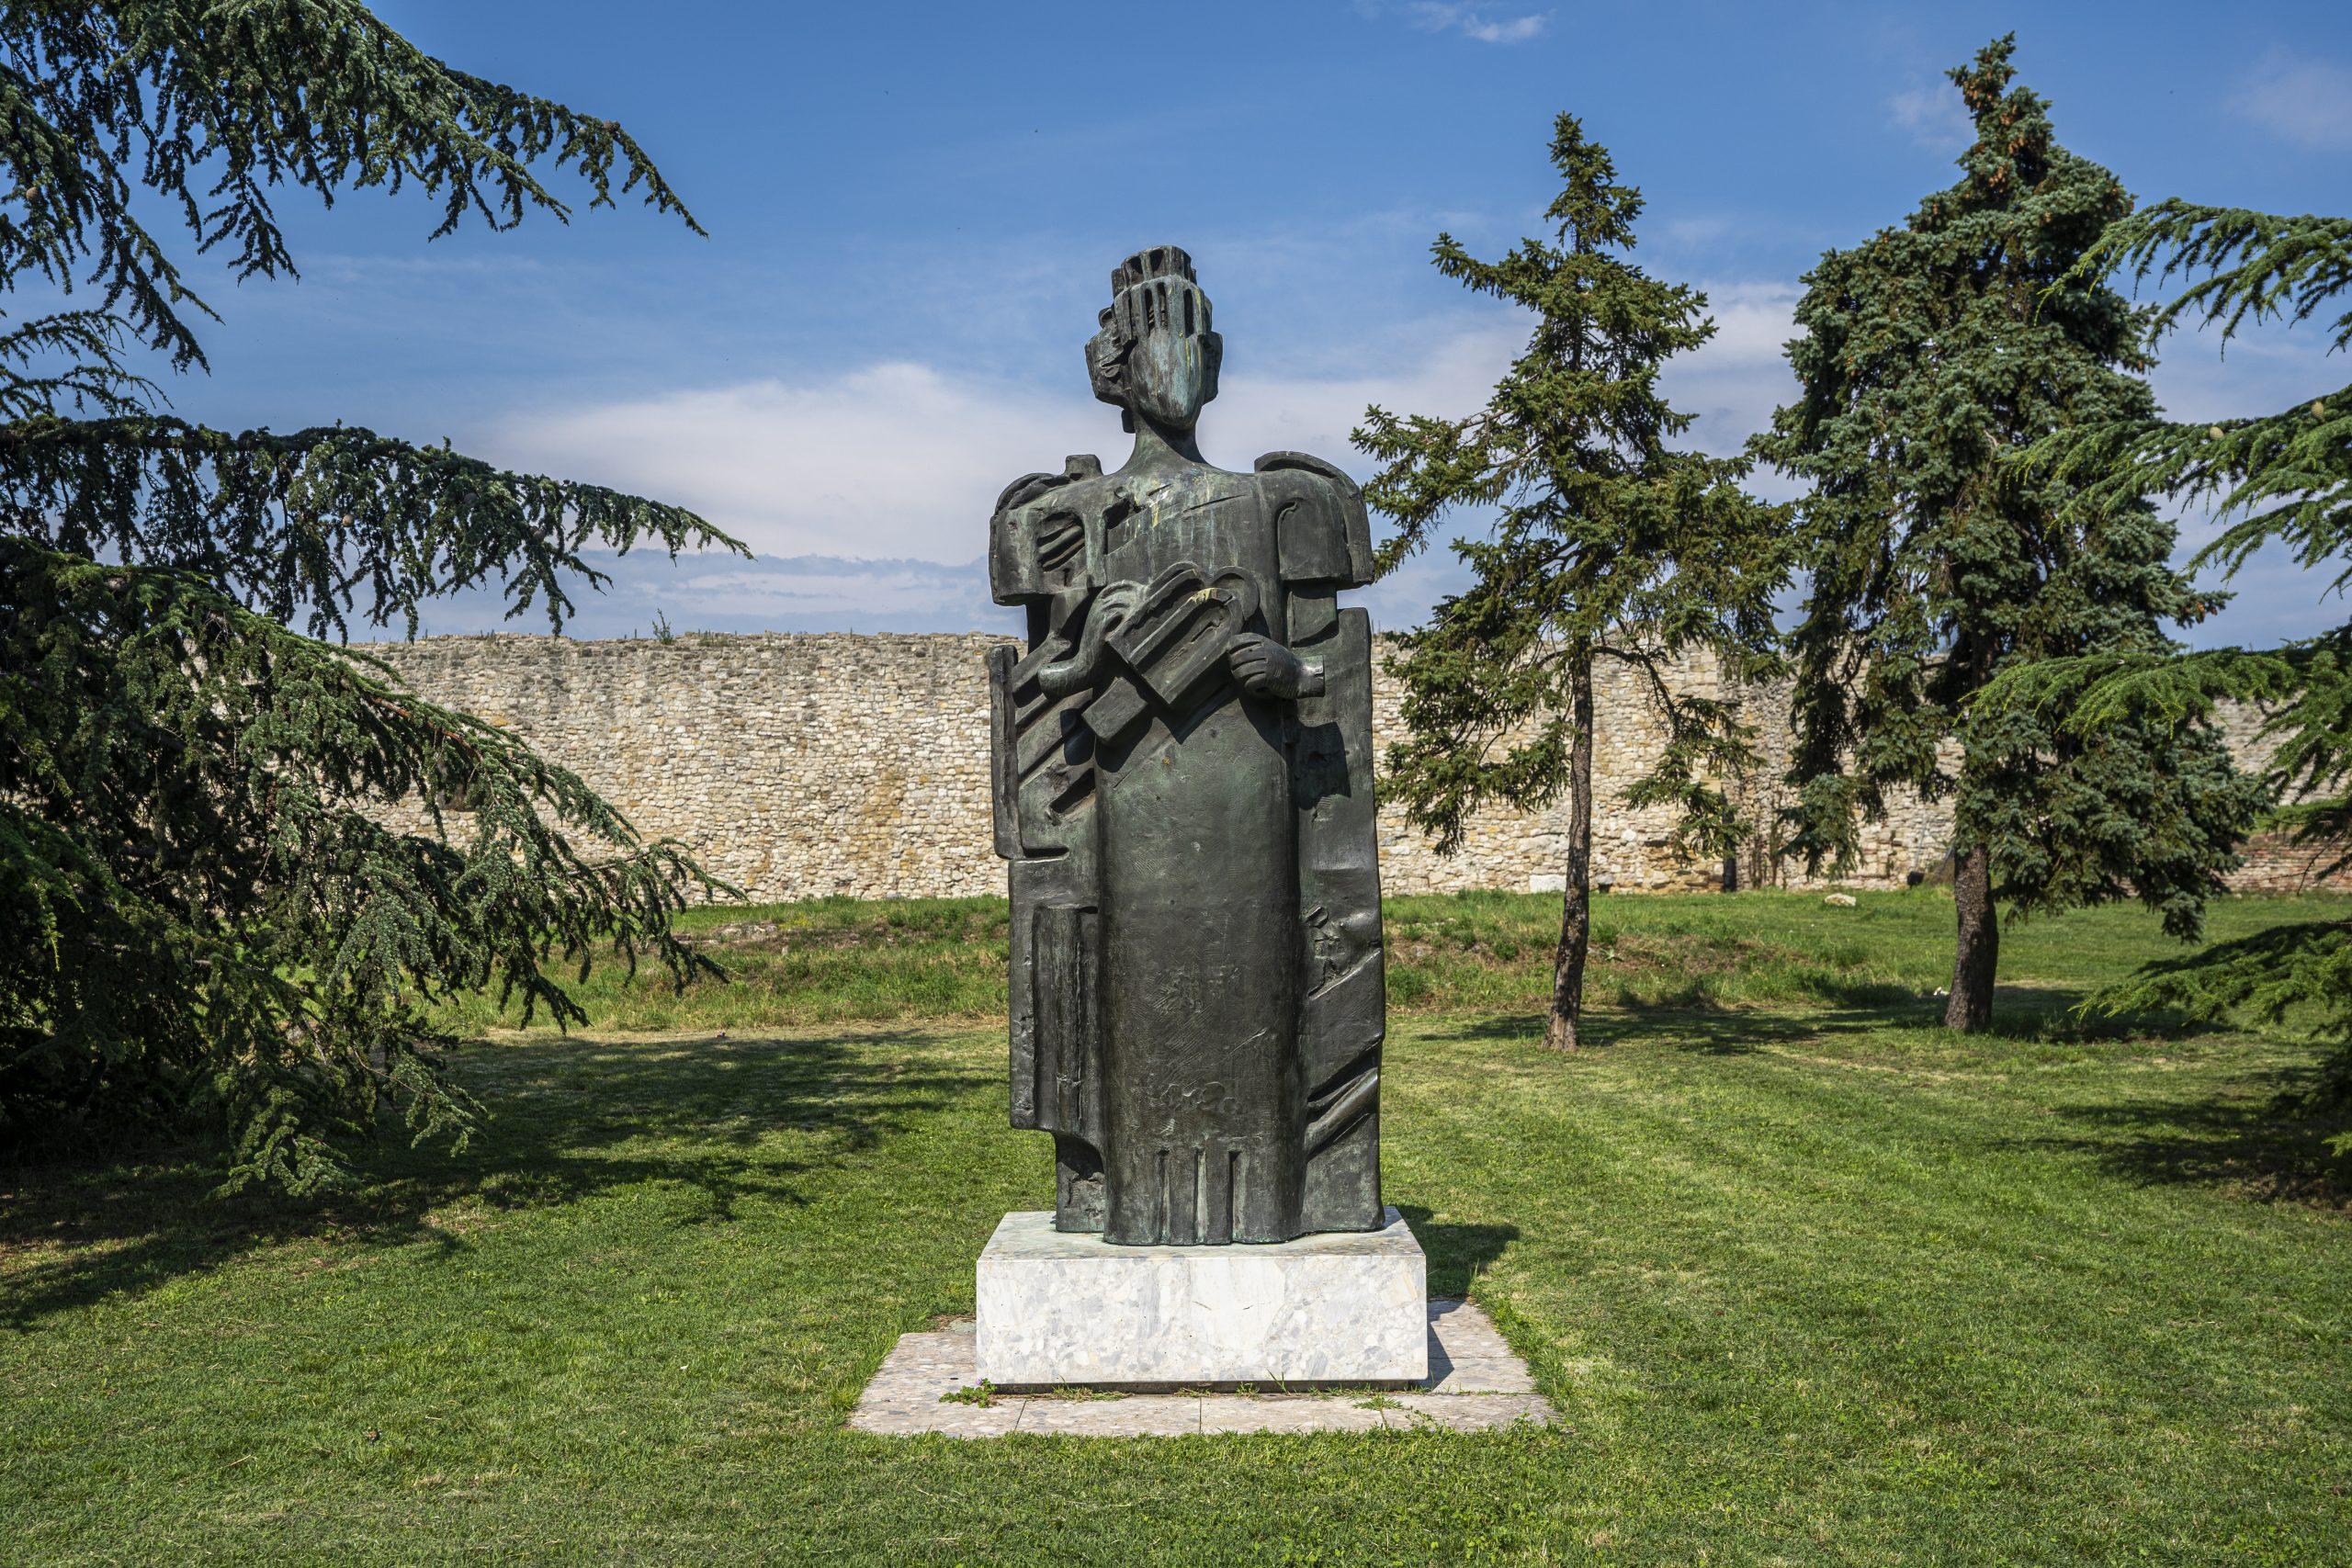 Spomenik despotu Stefanu Lazareviću